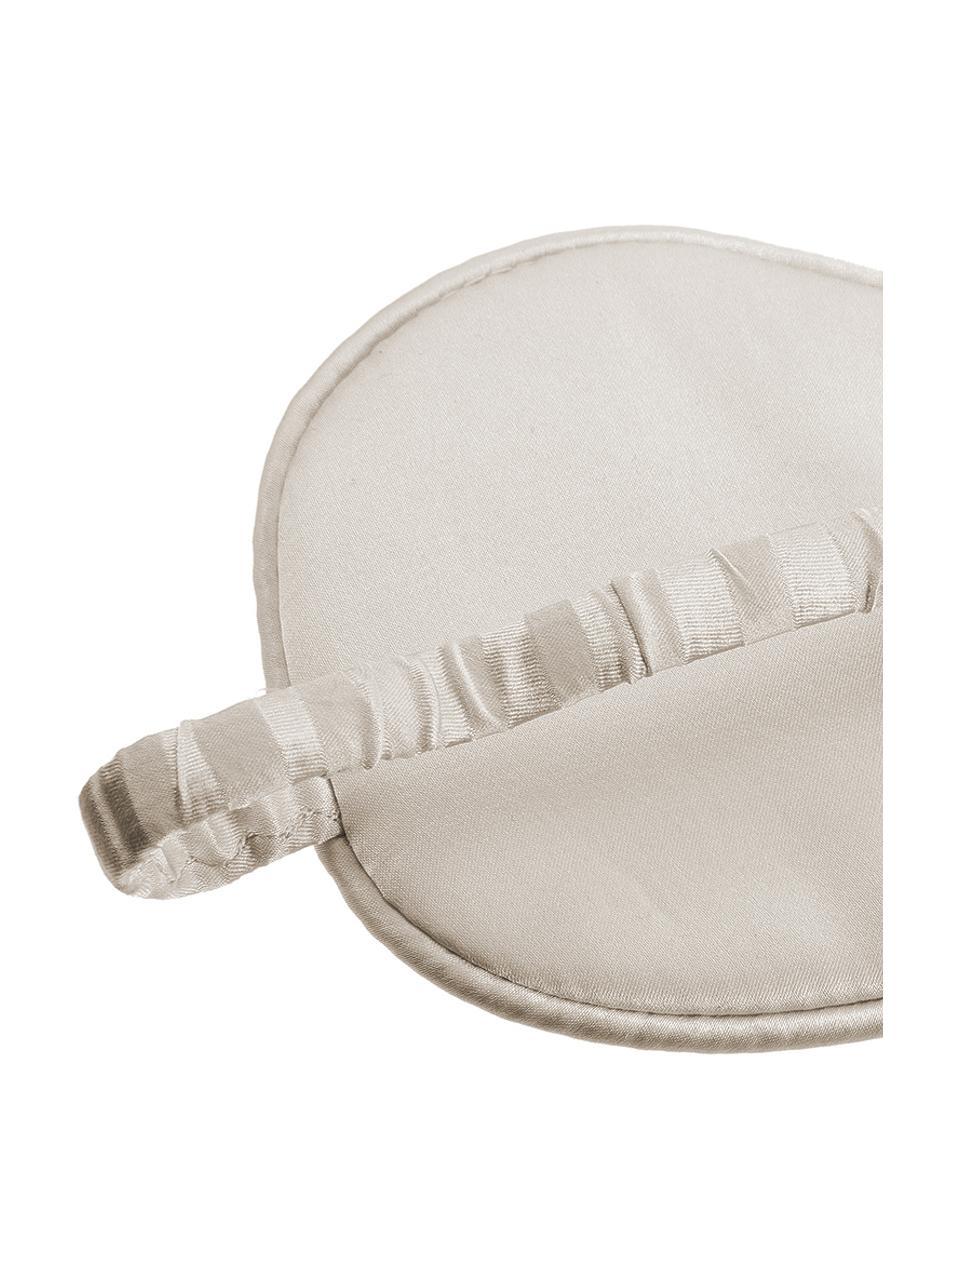 Maschera da notte in seta Silke, Interno: 100% seta, Cinturino: 100% seta, Avorio, beige, Larg. 21 x Alt. 9 cm